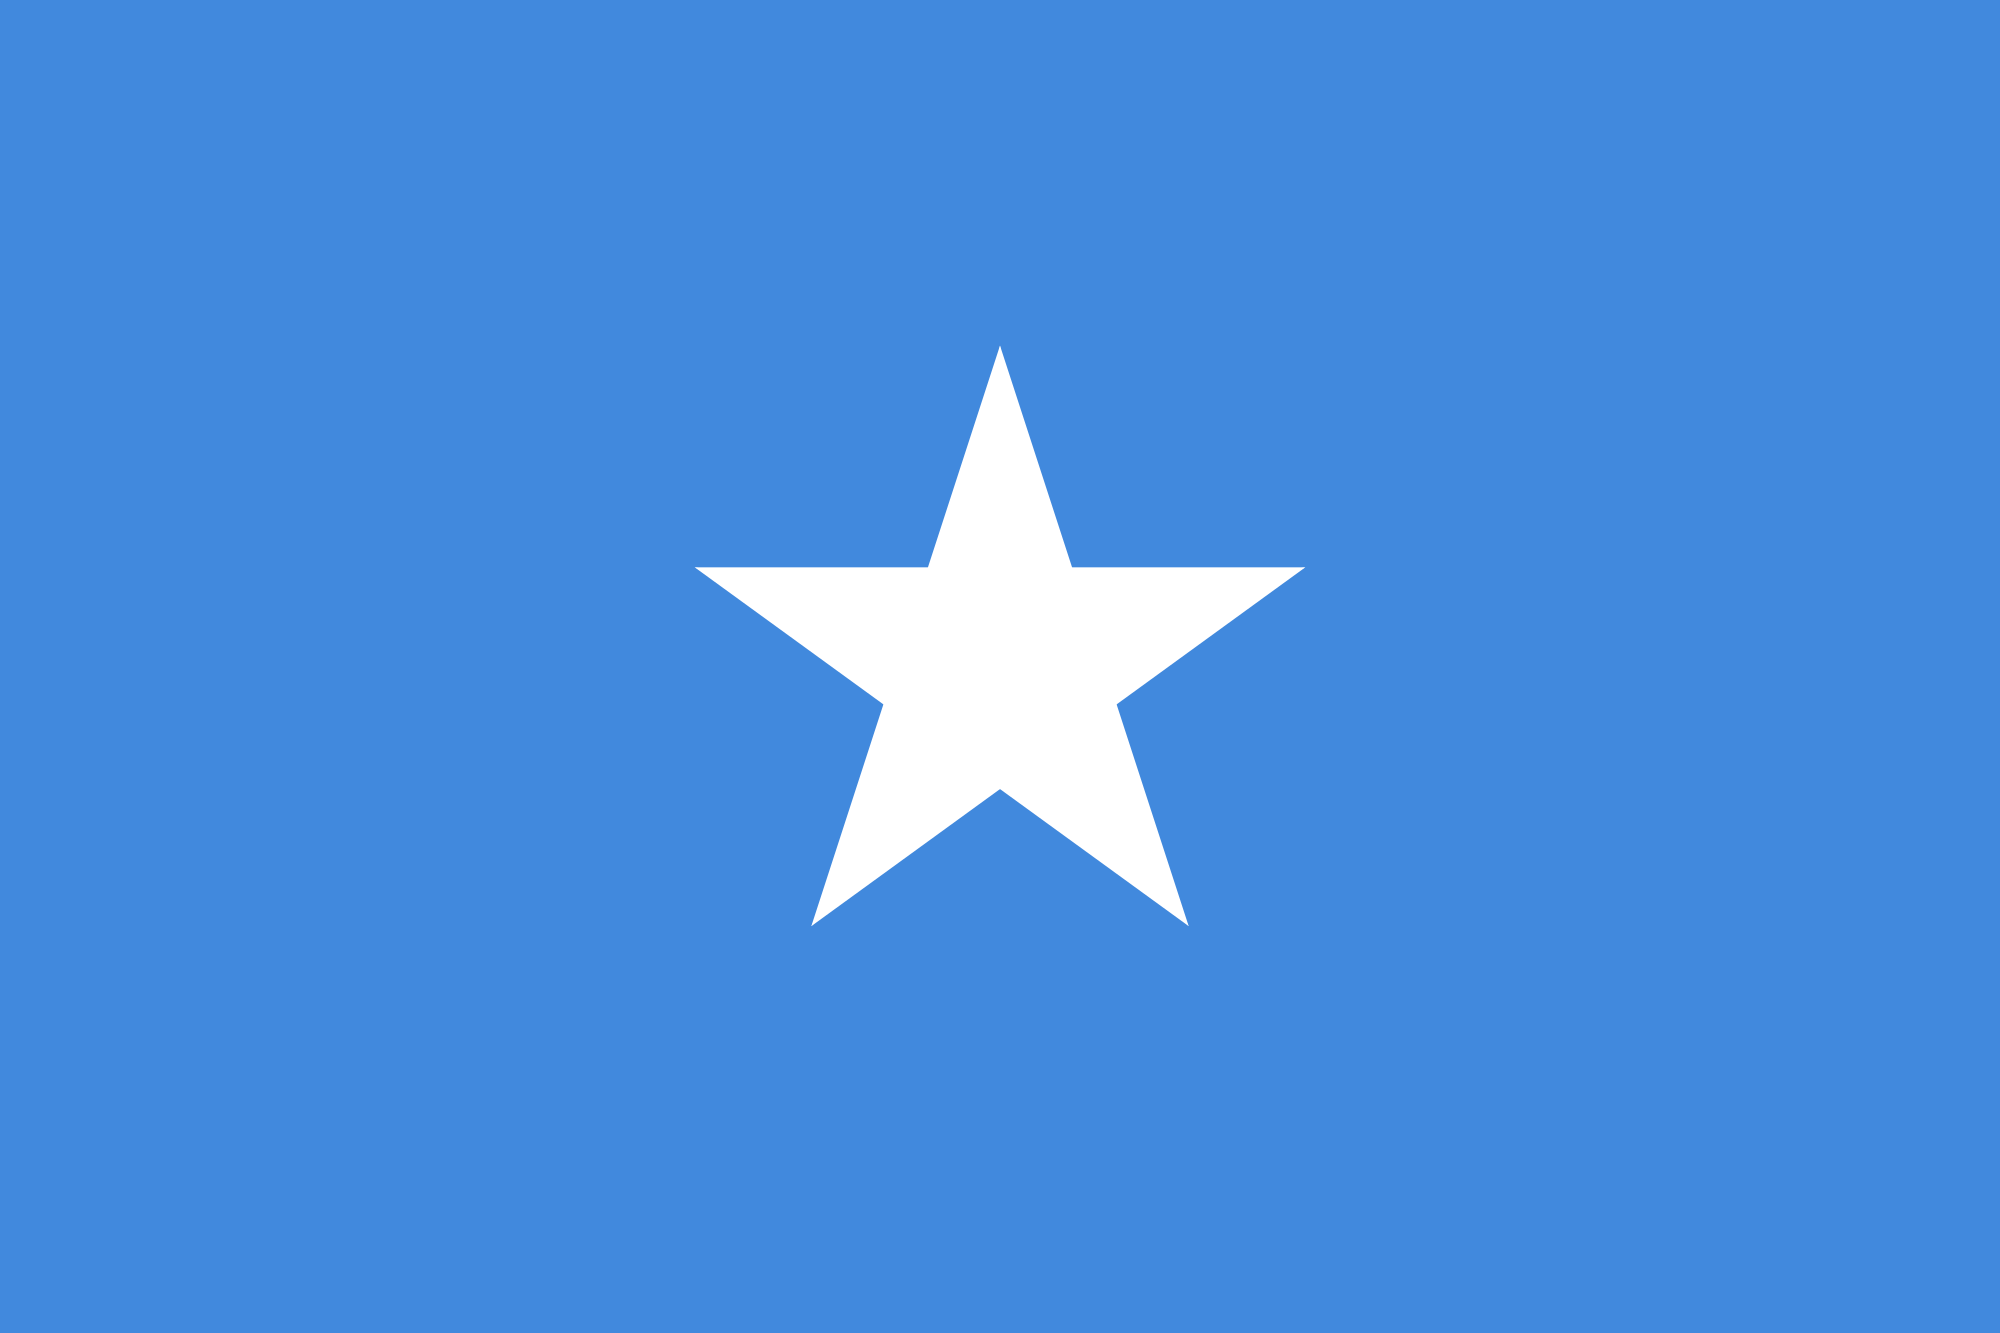 National Flag Of Somalia